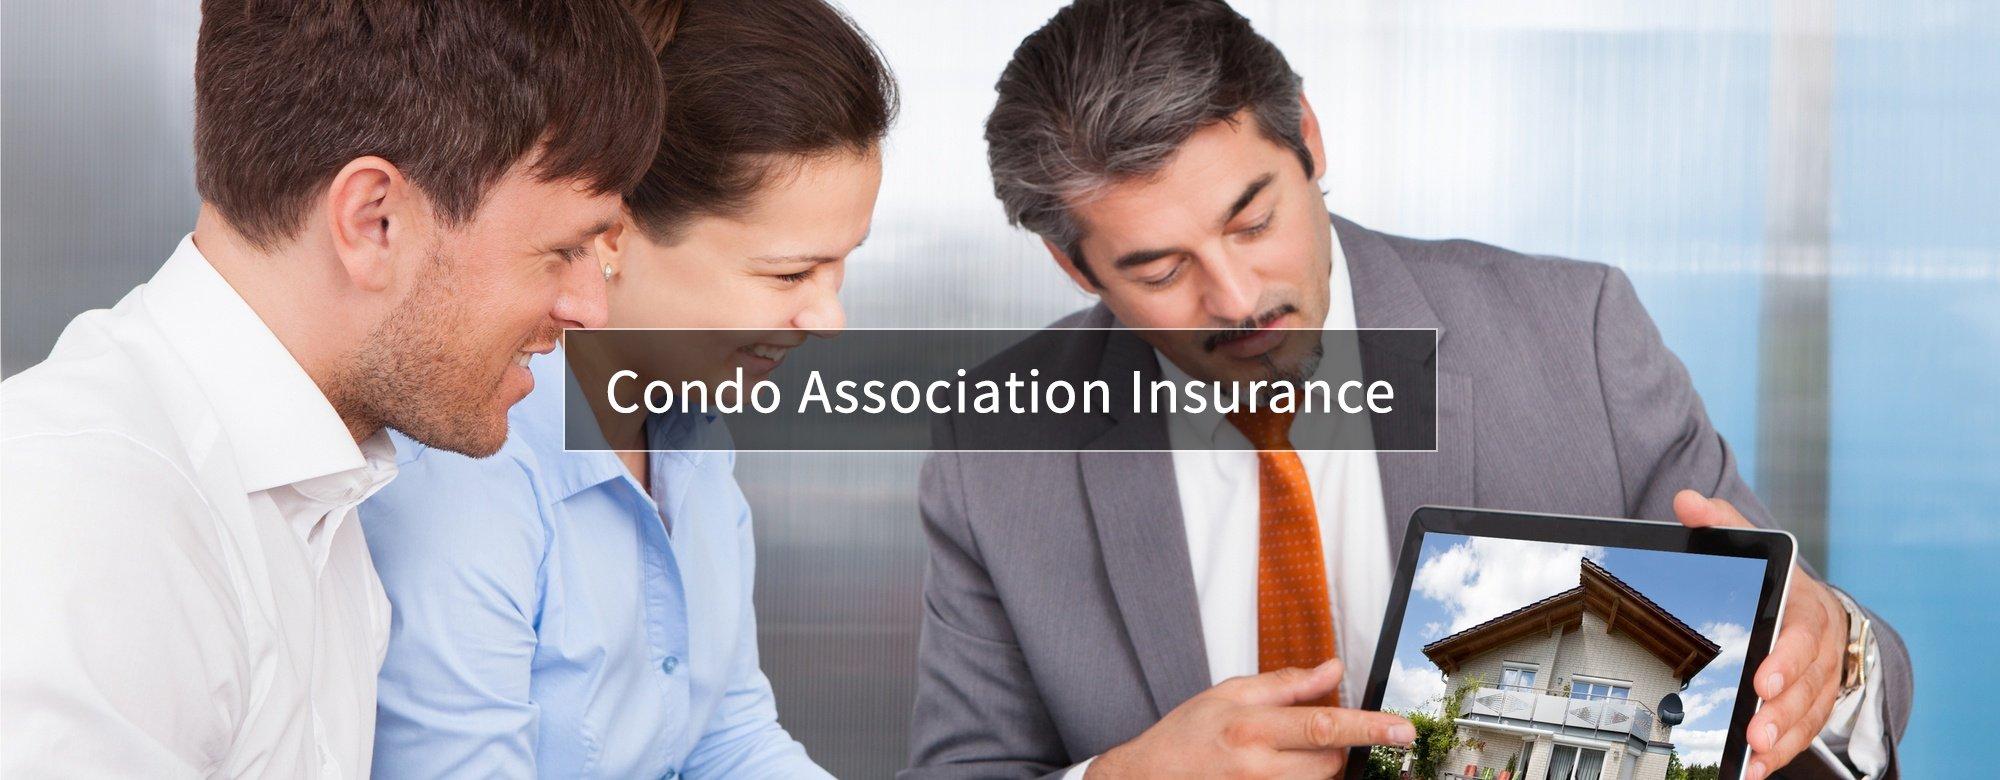 Condo Association Insurance inMassachusetts